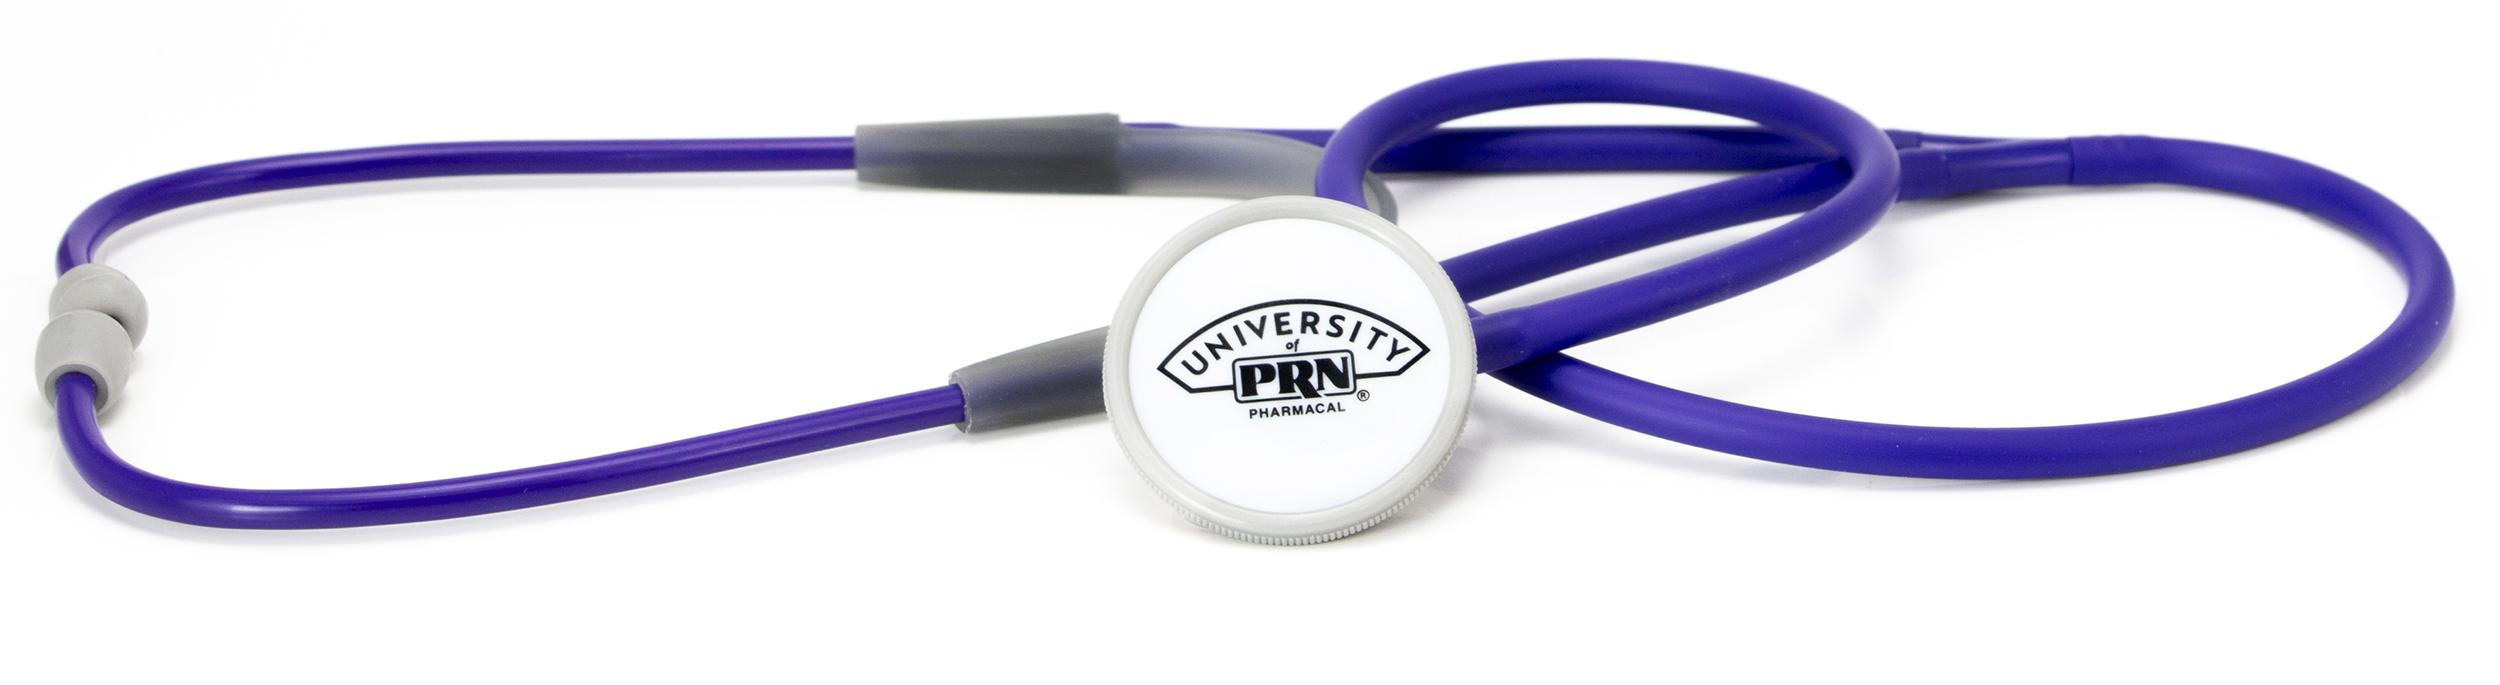 PRN Stethoscope.jpg